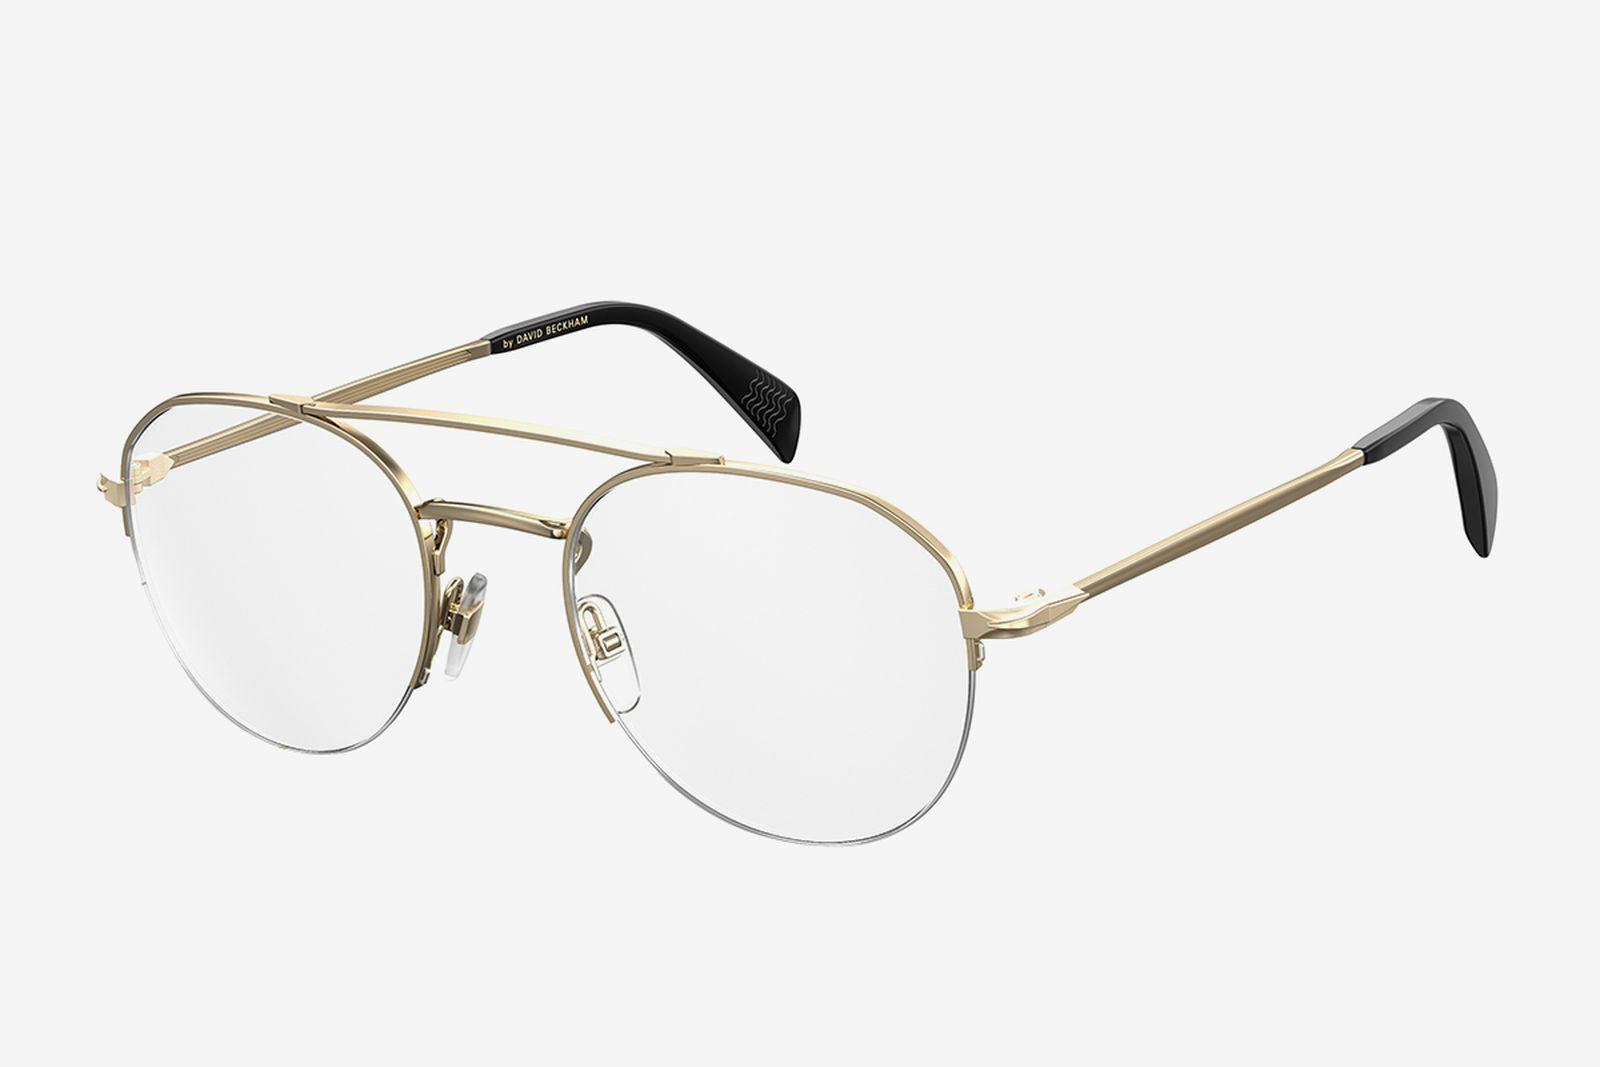 db-sunglasses-ss20-06